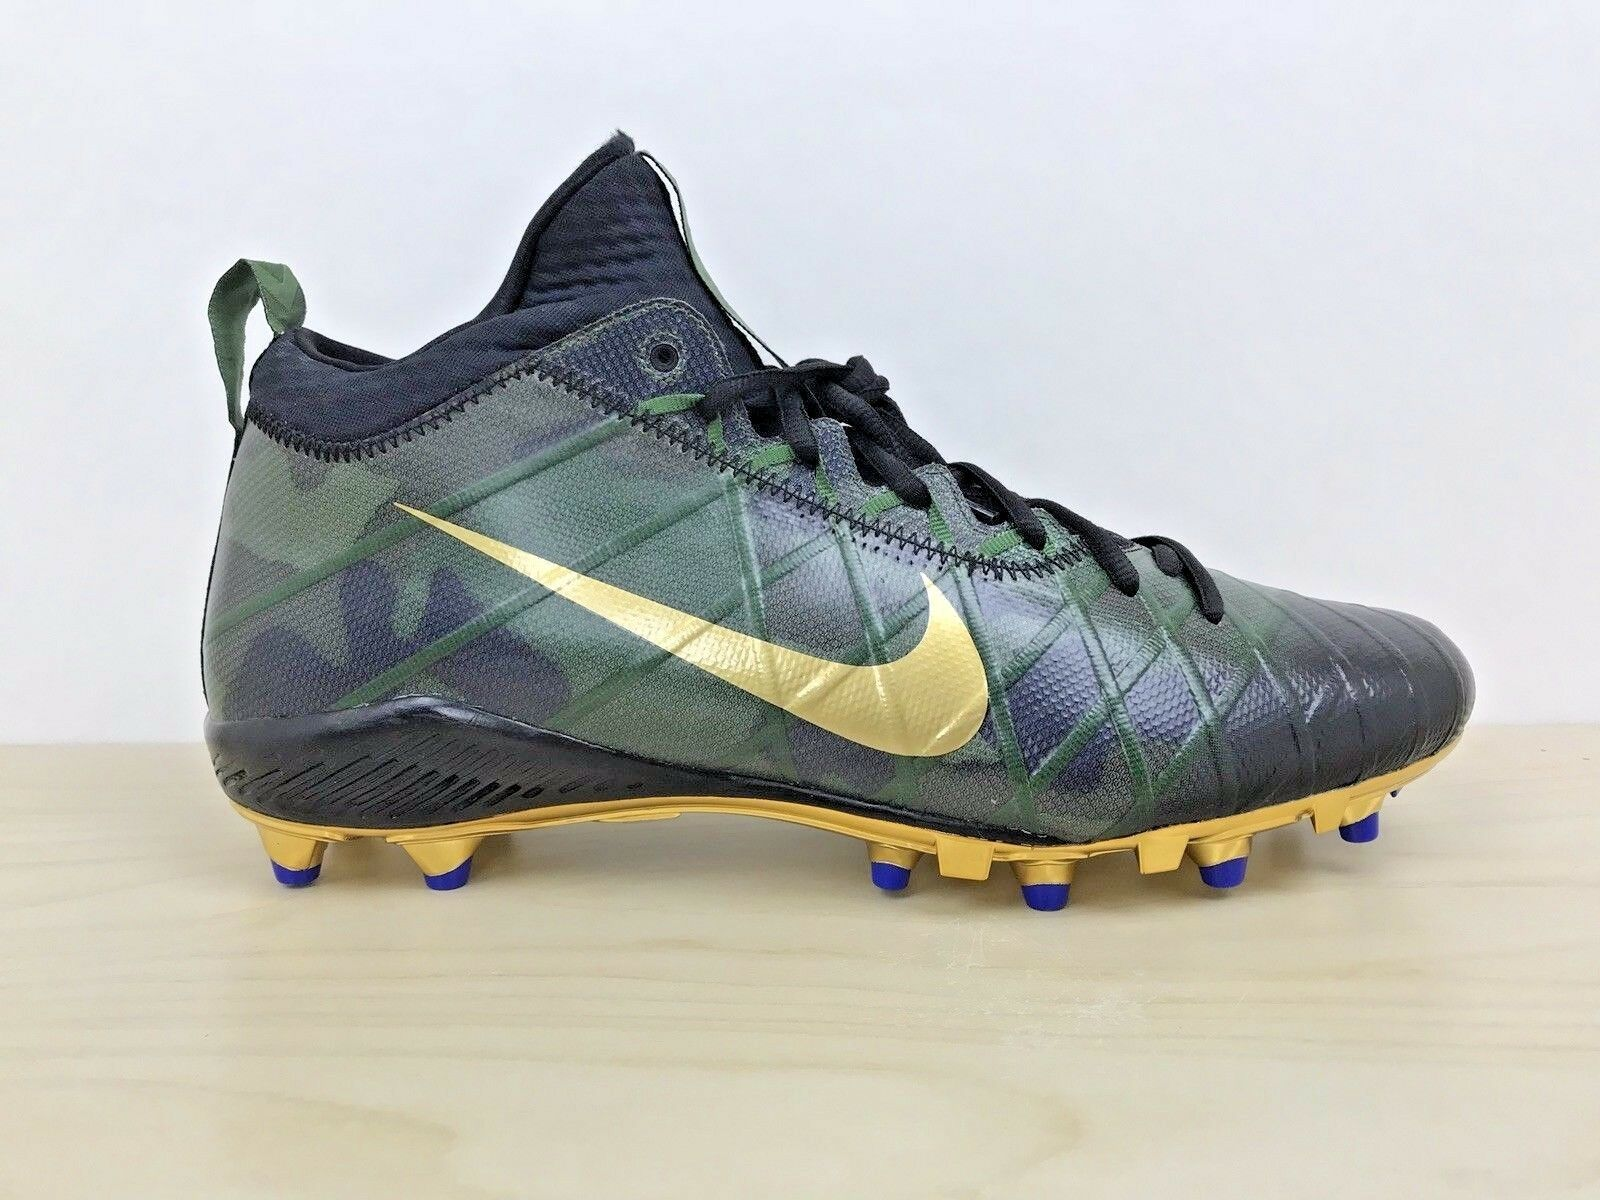 NIKE ALPHA FIELD GENERAL ELITE 3 TD CAMO/GOLD Football Cleats Size 14 833390-371